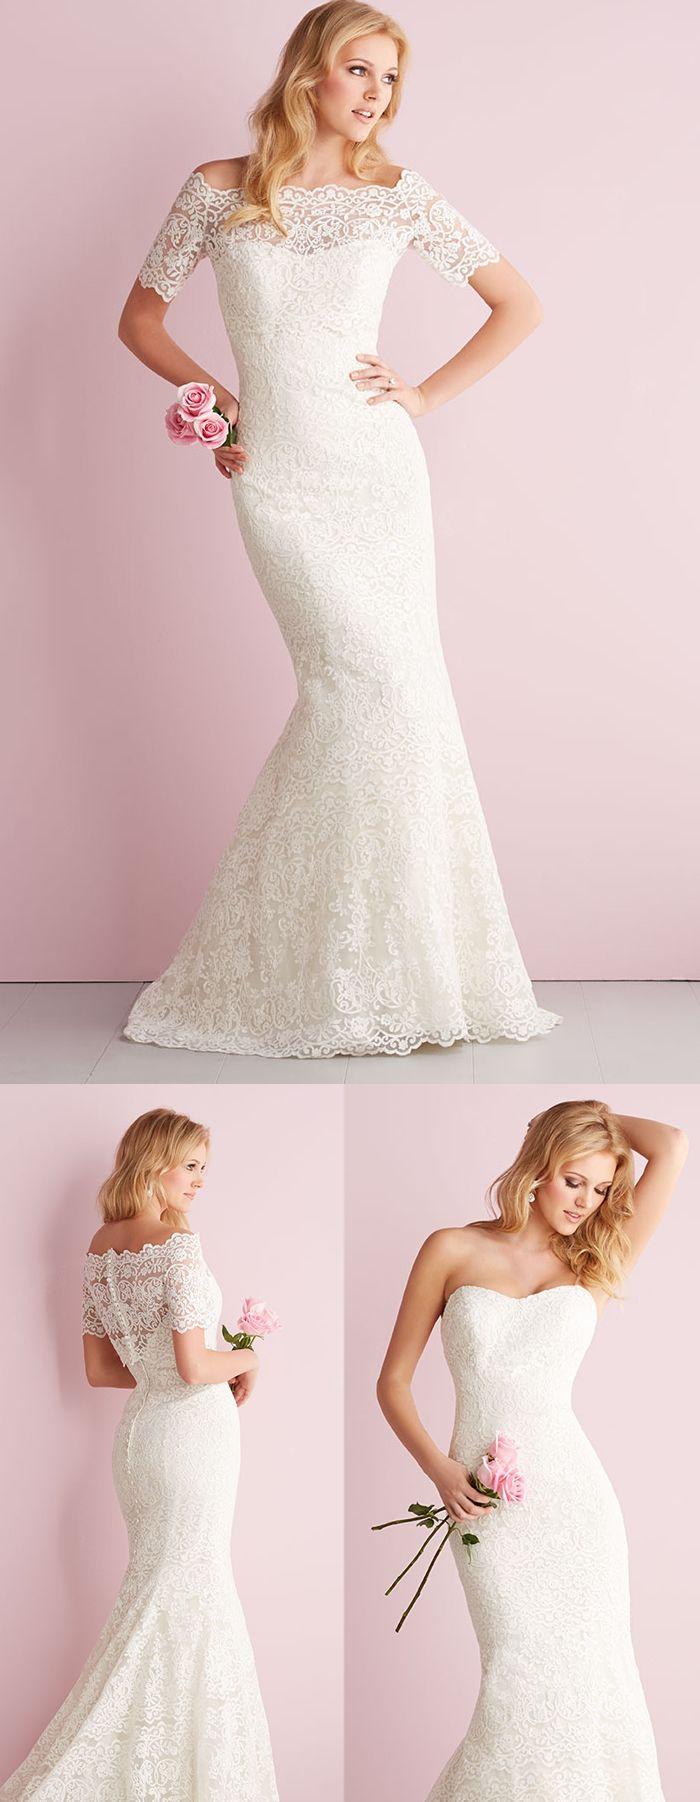 25 best ideas about Wedding Dress Bolero on Pinterest  Beaded bolero wedding Wedding bolero